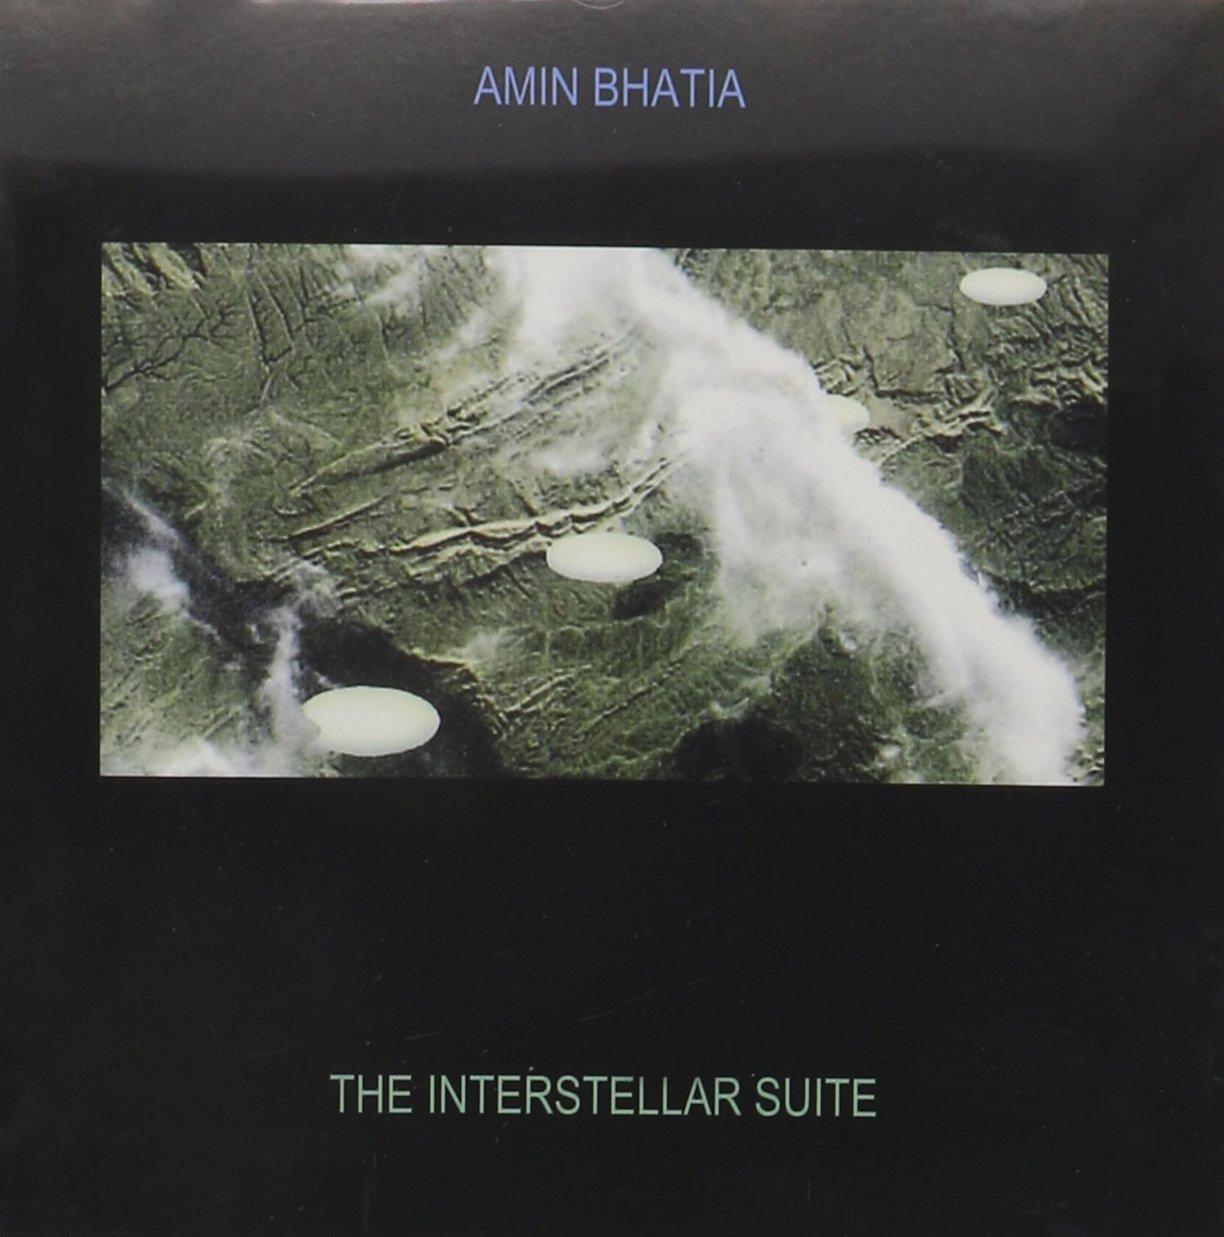 Interstellar Suite